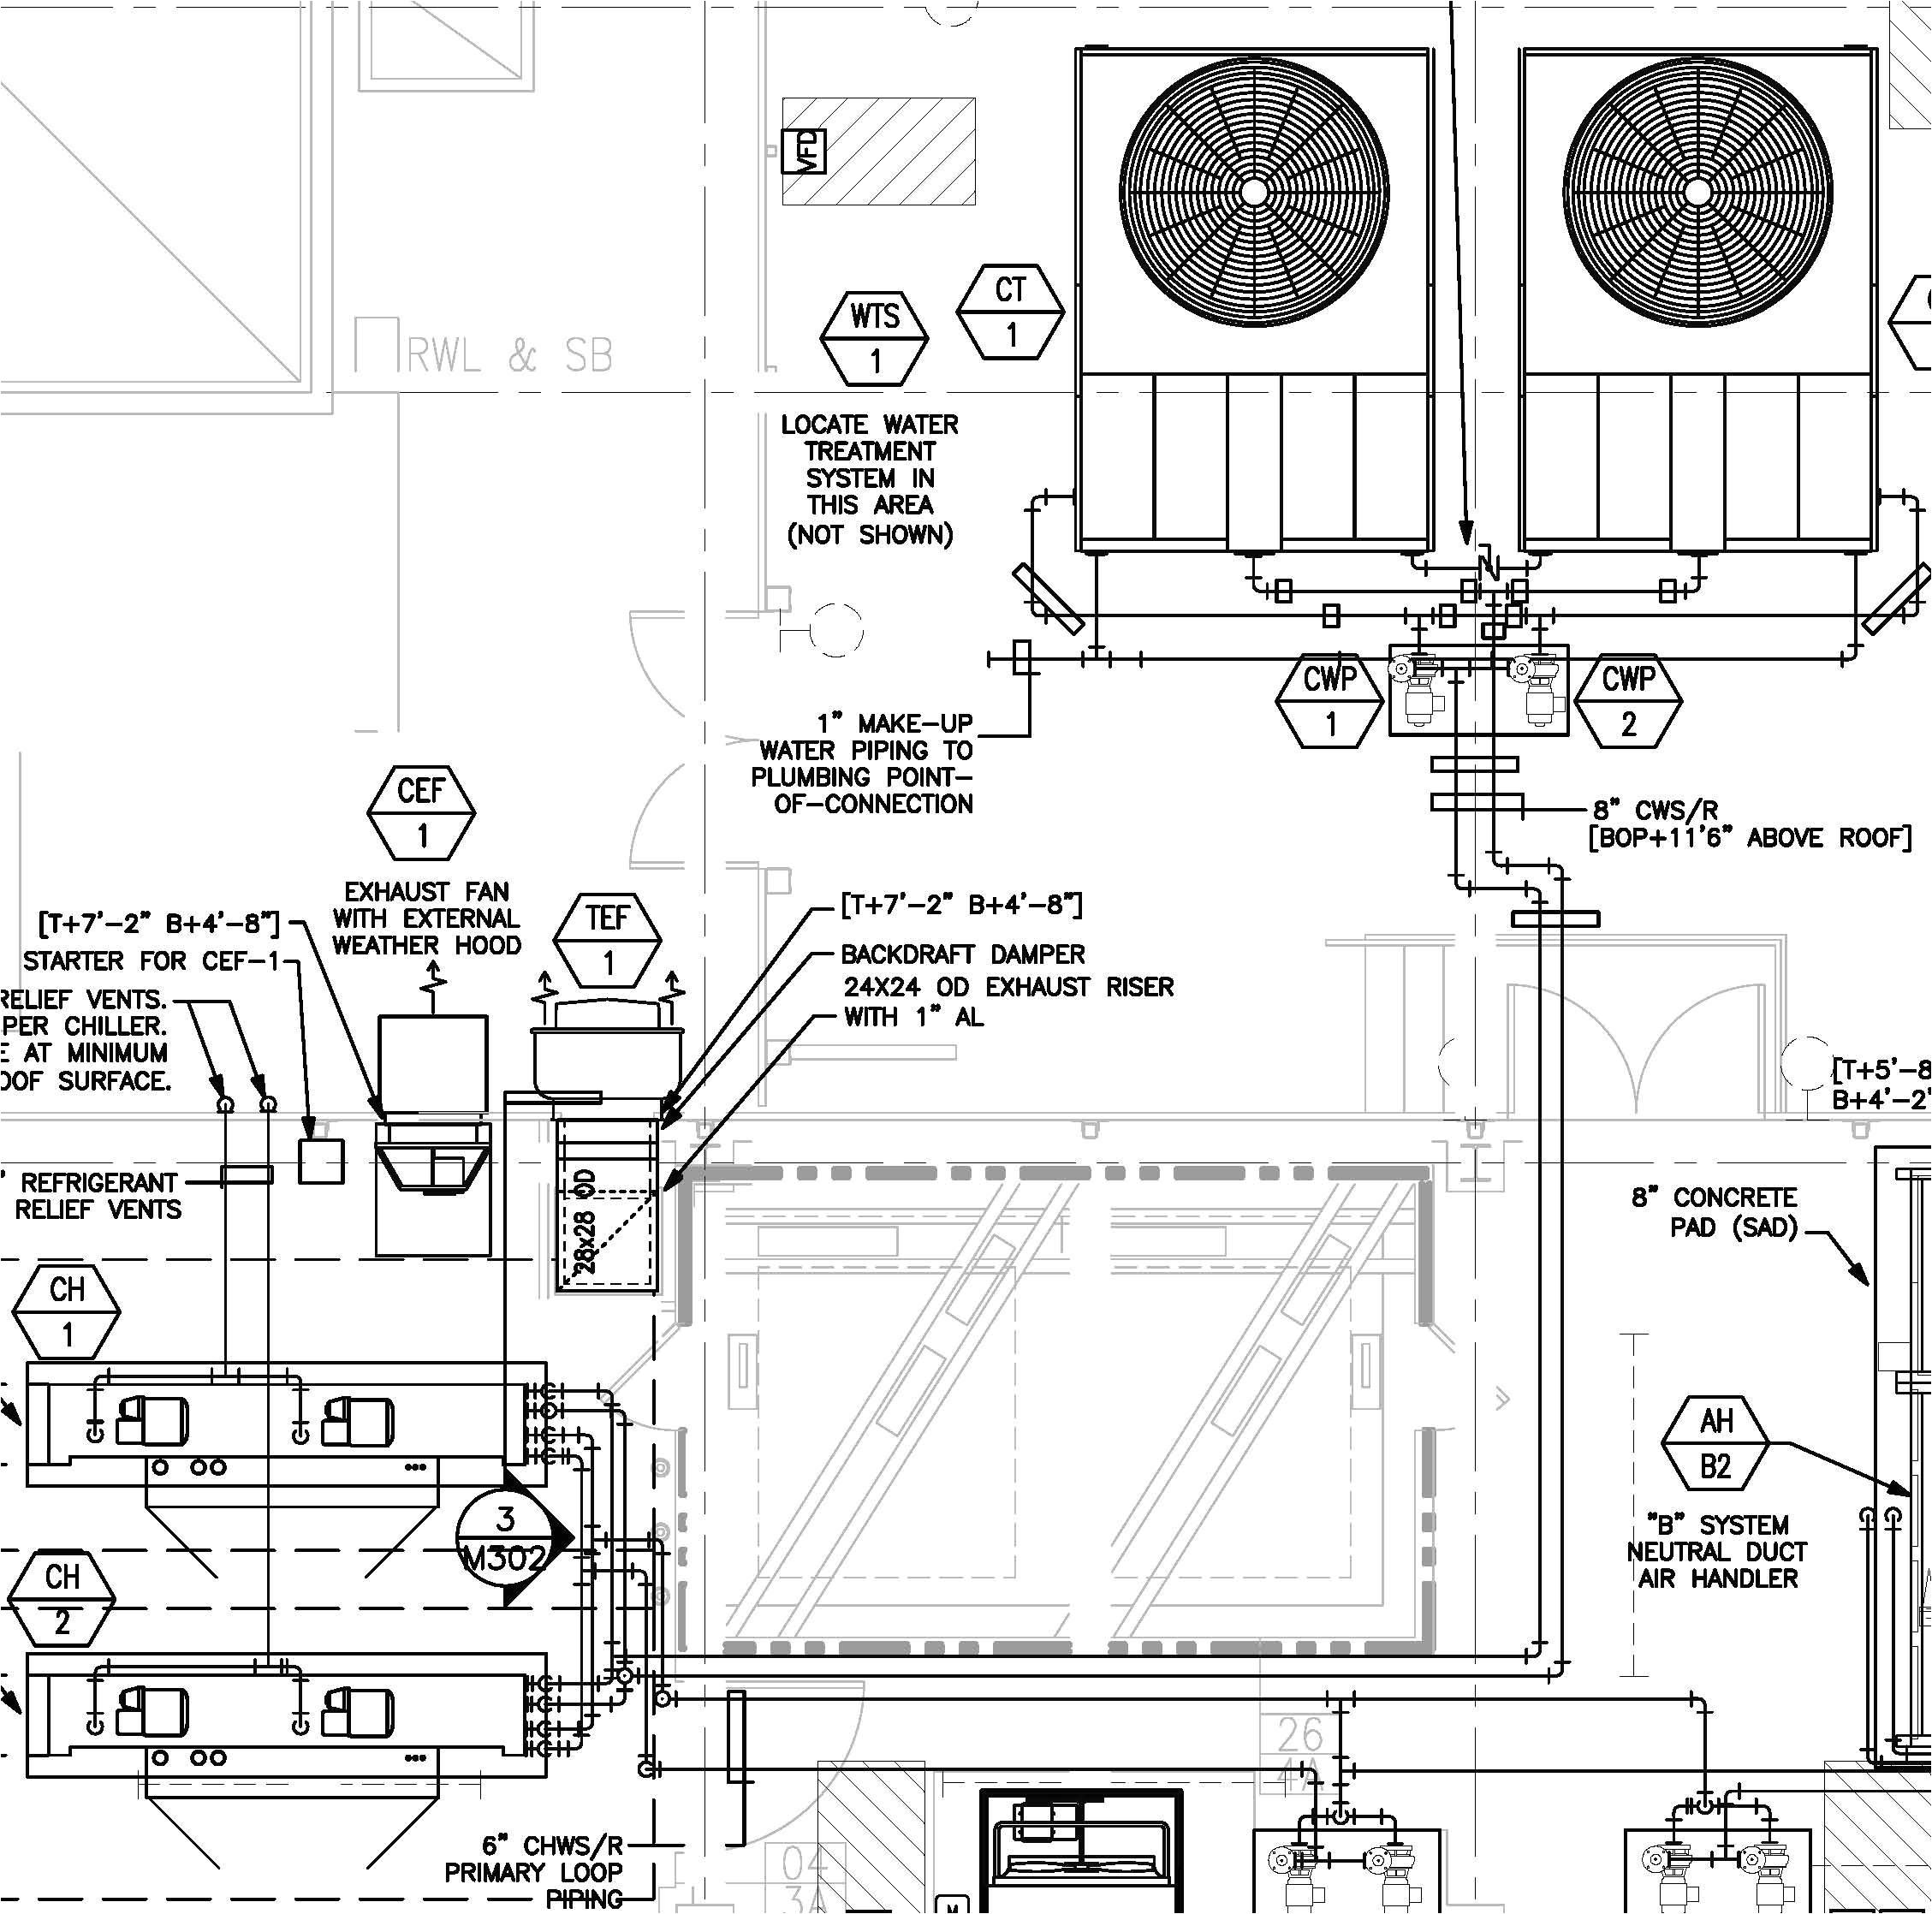 chillers sentry wiring diagram option wiring diagram york chiller schematic diagram industrial water chiller diagram wirings